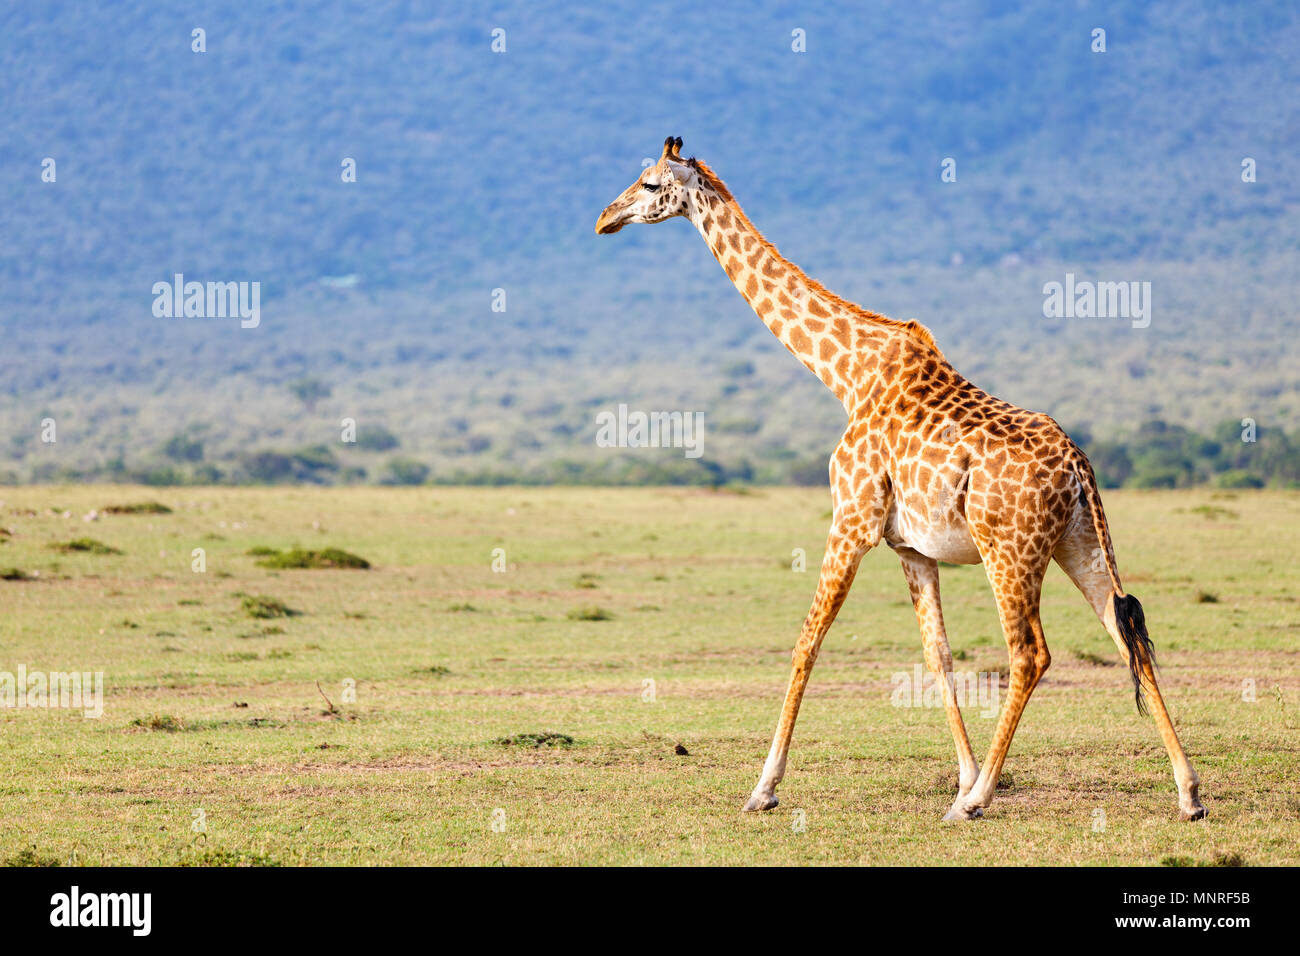 Jirafa en Masai Mara el parque safari en Kenia África Imagen De Stock